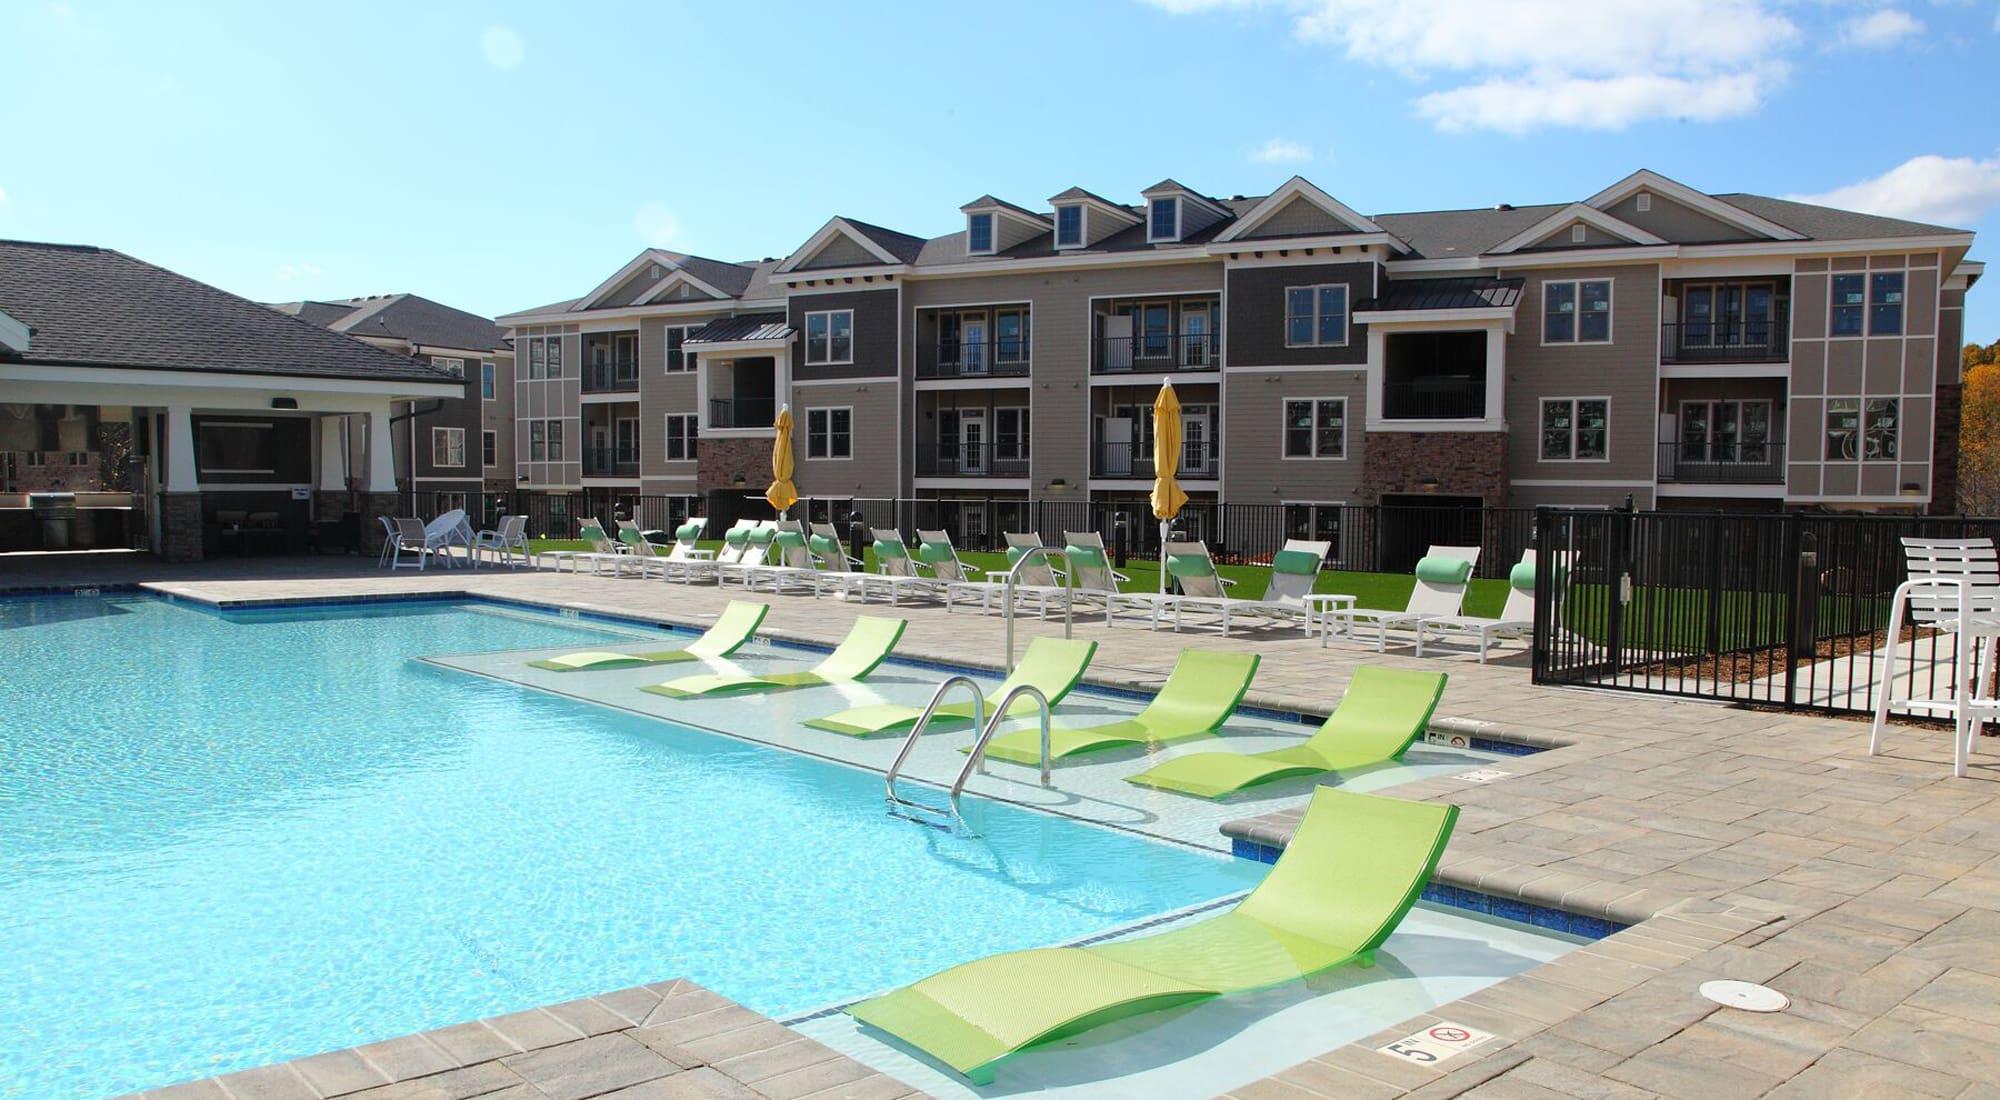 Apartments in Fredericksburg, VA